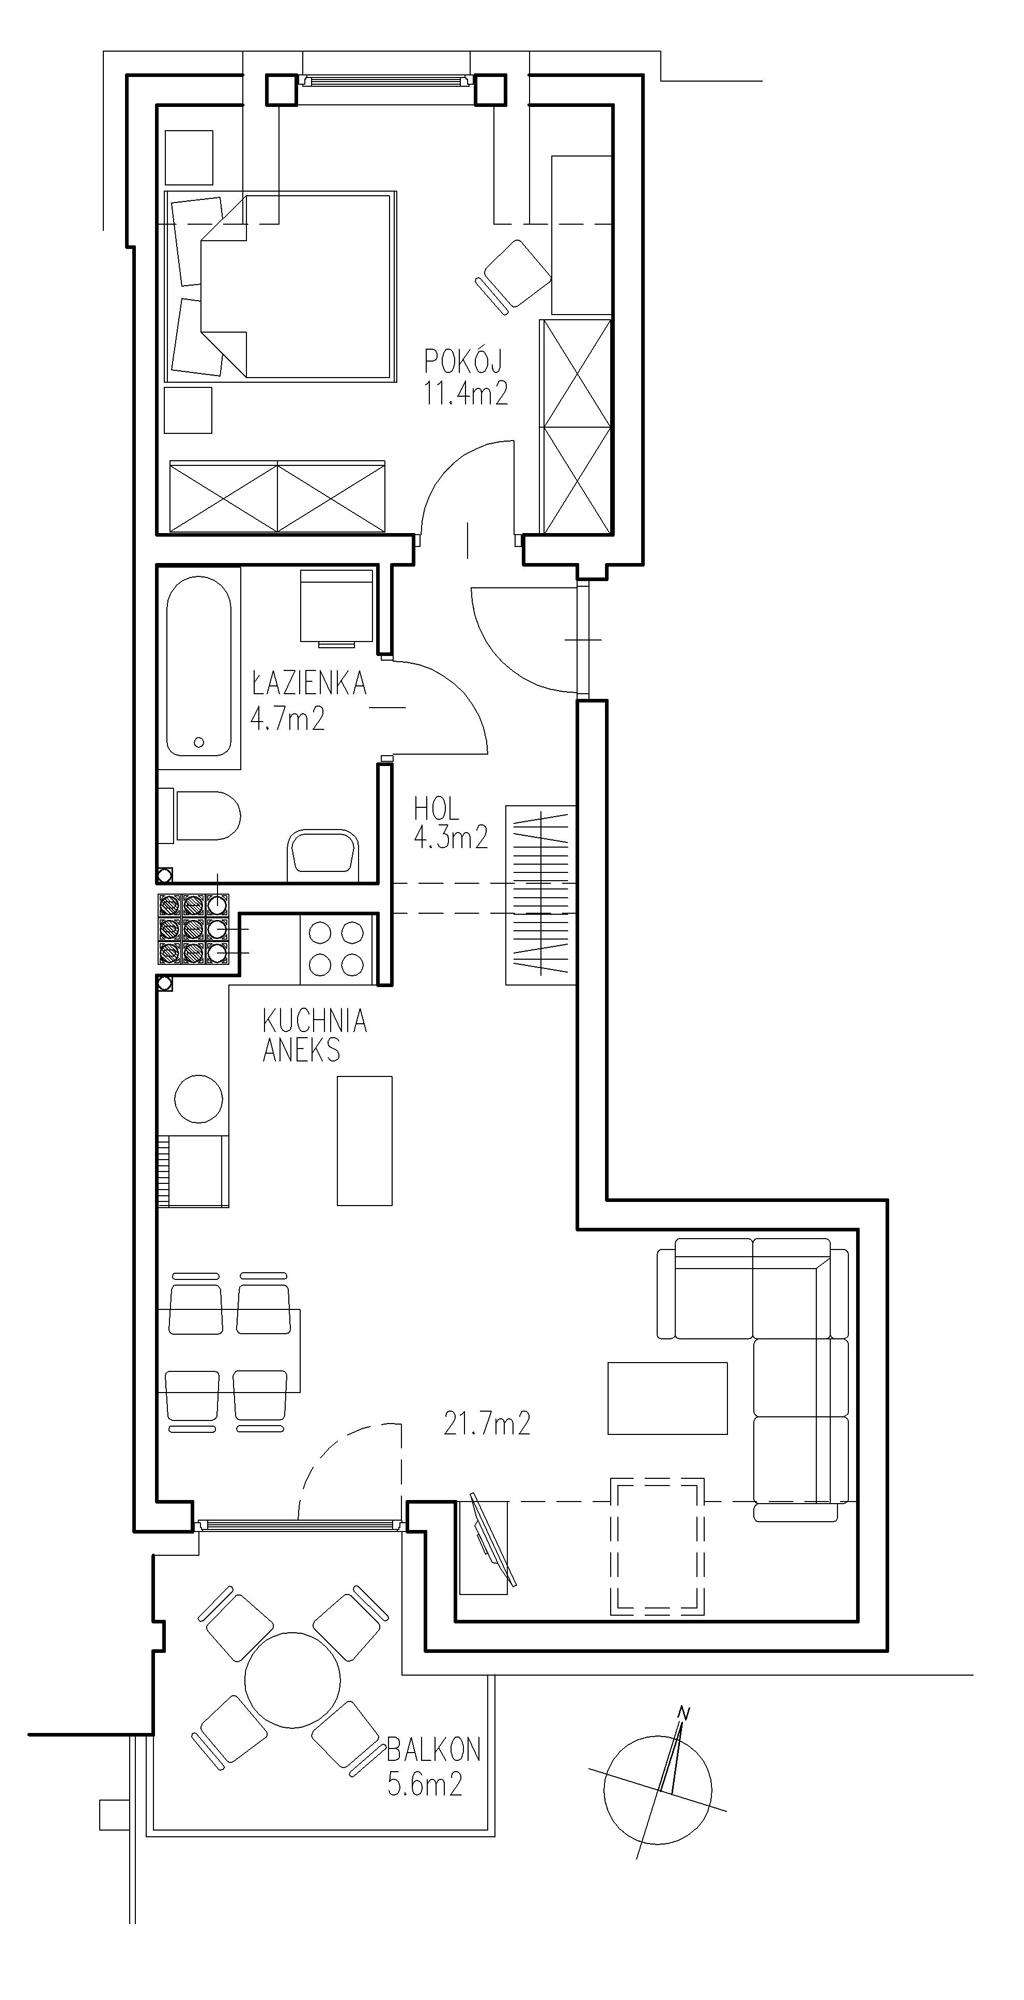 KTK Deweloper - Ełk - ul. Ogrodowa - Blok nr 2 - Mieszkanie nr 12